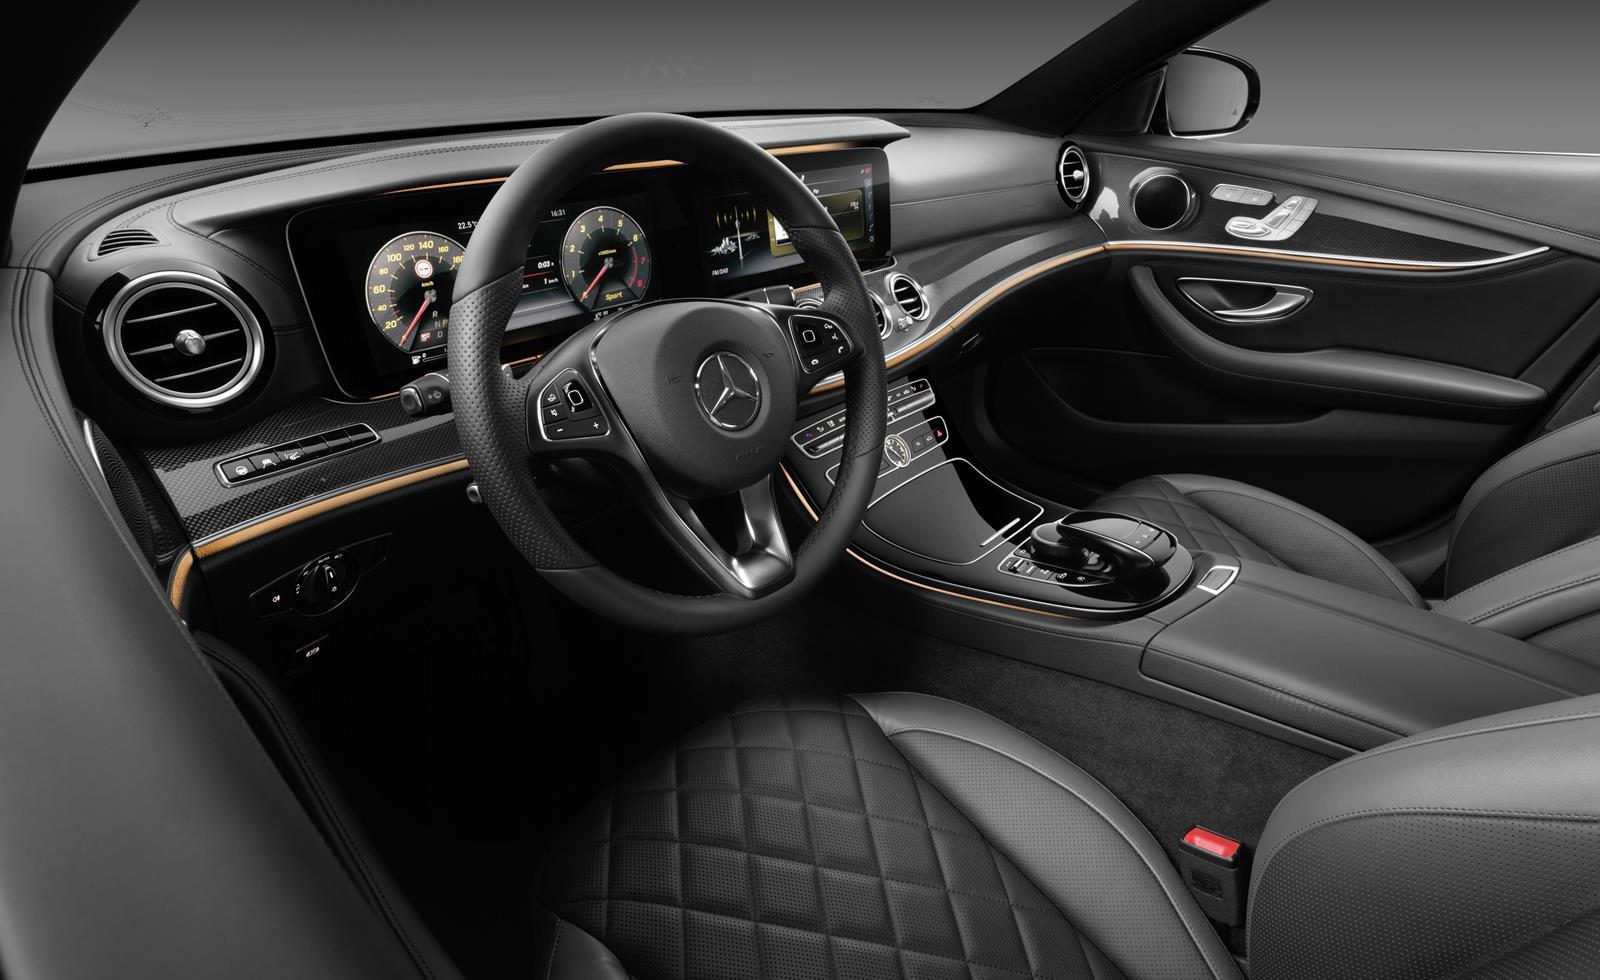 Interieur mercedes  Mercedes-Benz TecDay: Das Interieur der neuen E-Klasse! | autofilou.at